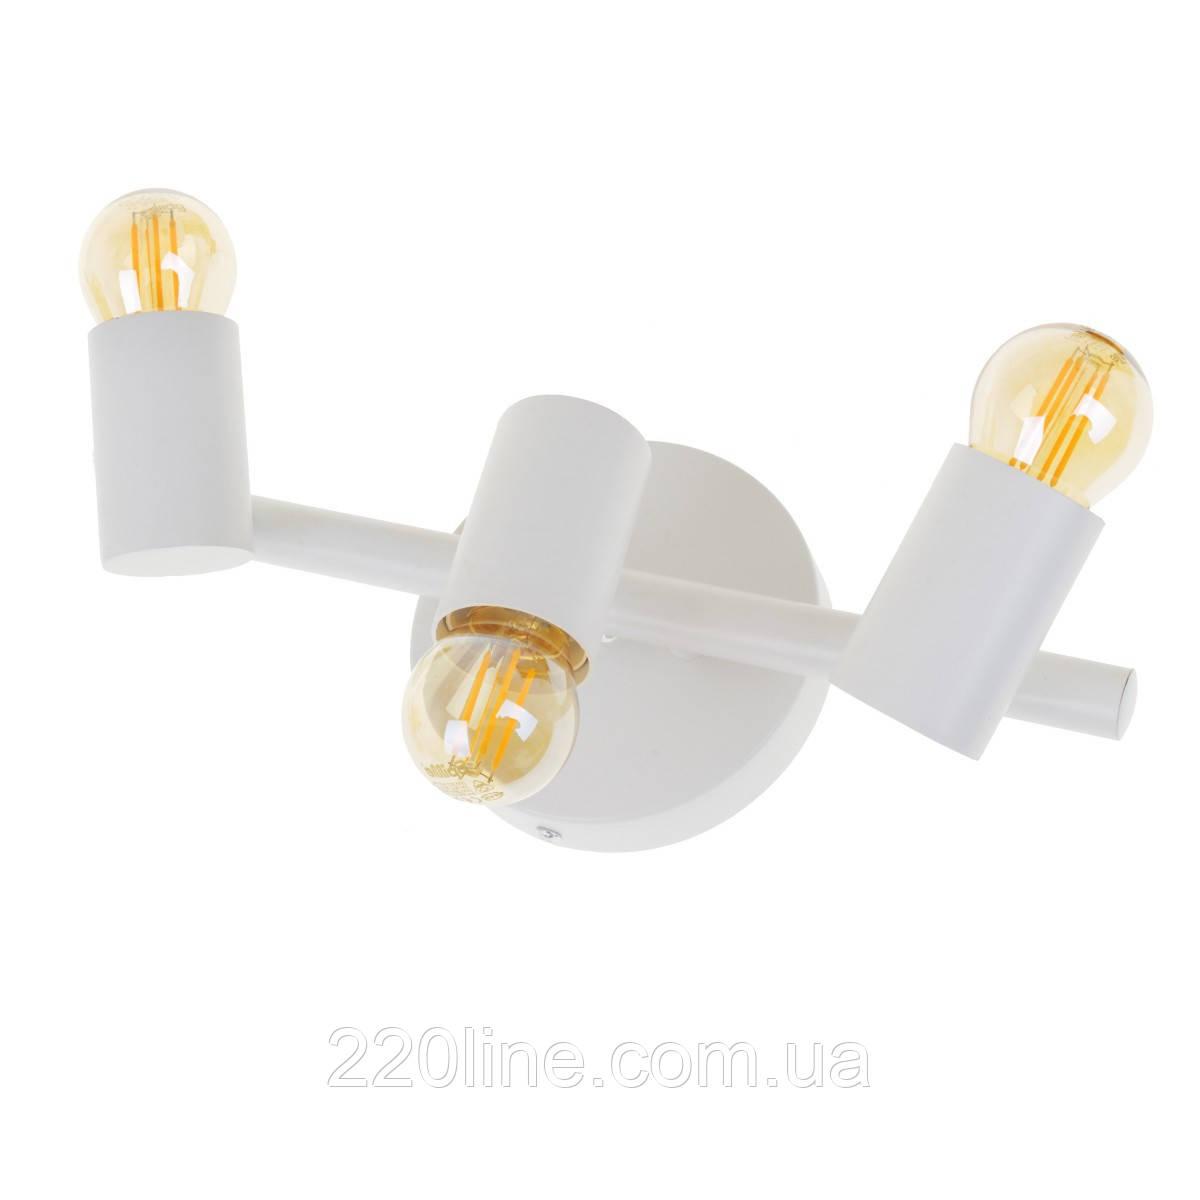 Светильник лофт спот накладной HTL-500/3 E27 WH